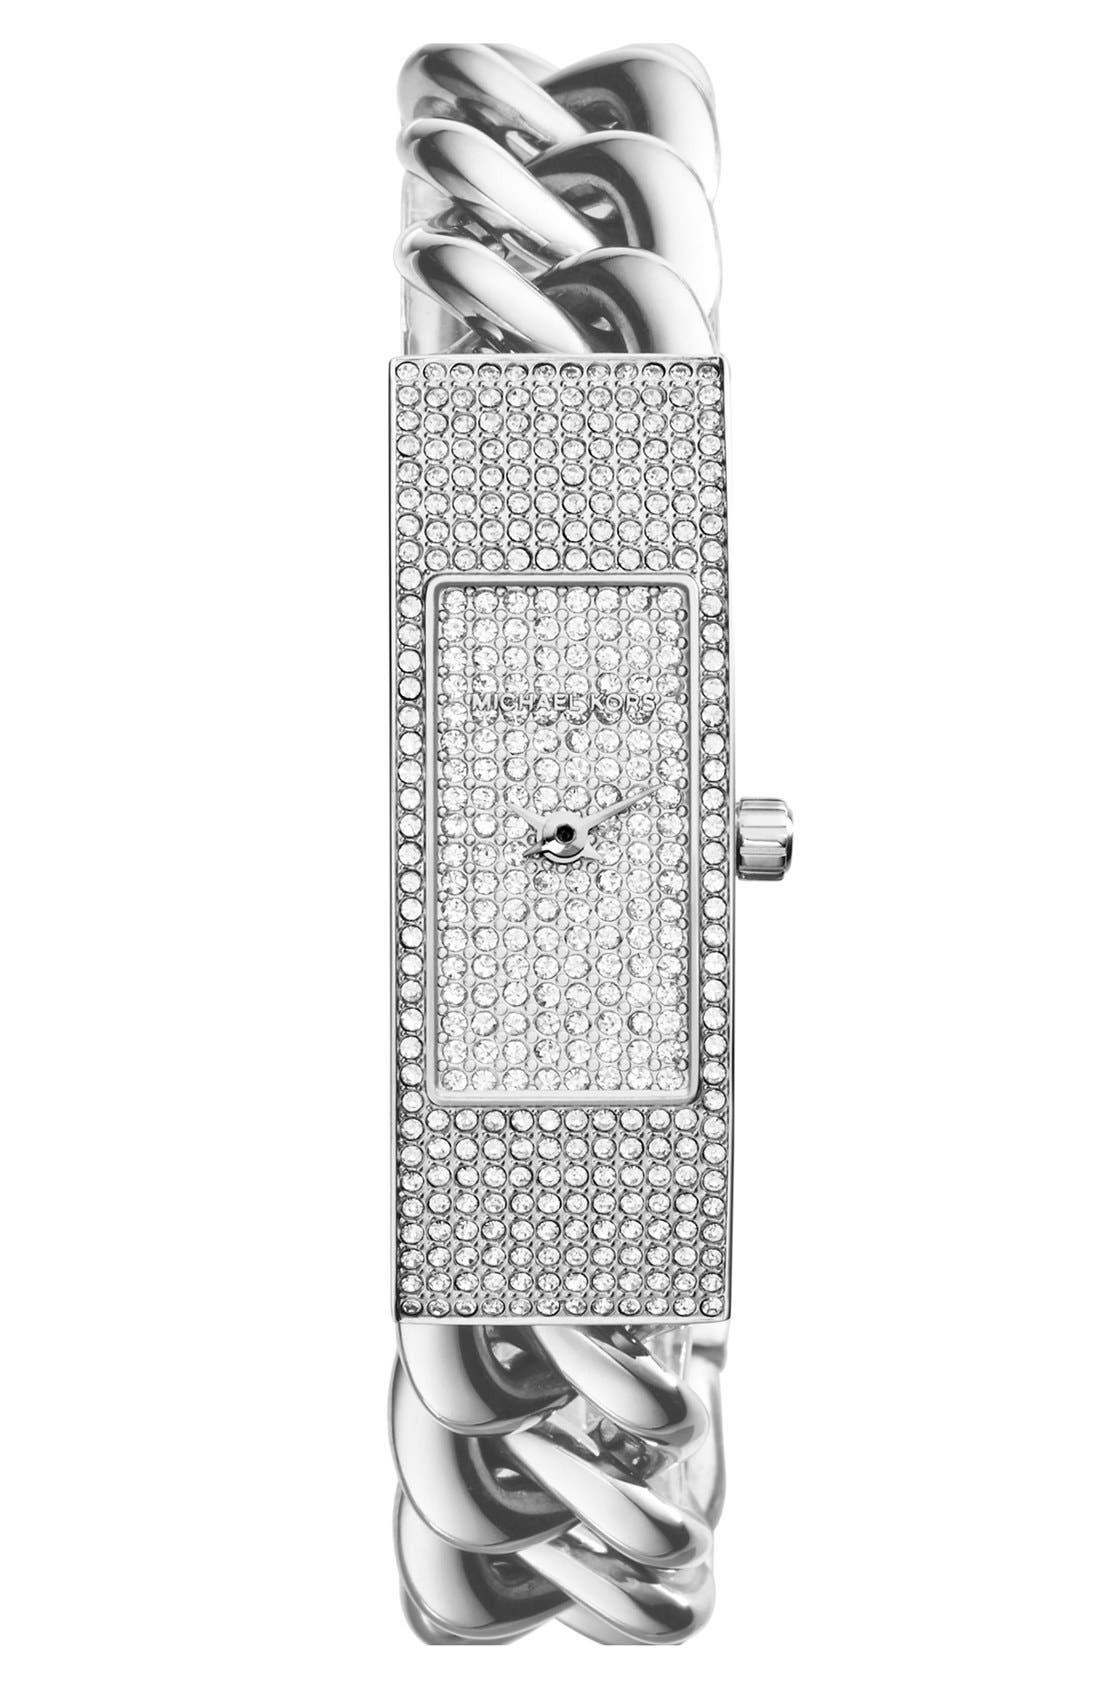 Main Image - Michael Kors 'Hayden' Pavé Crystal Chain Link Bracelet Watch, 16mm